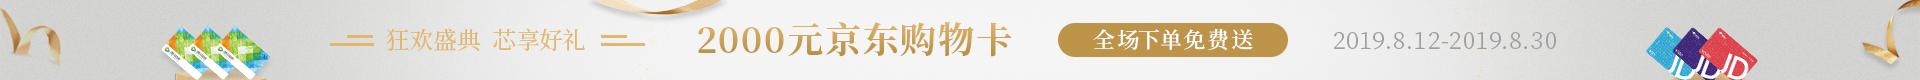 muRata(村田)贴片电感LQG15HN8N2J02D采购批发_LQG15HN8N2J02D价格_贴片电感品牌厂家现货-猎芯网